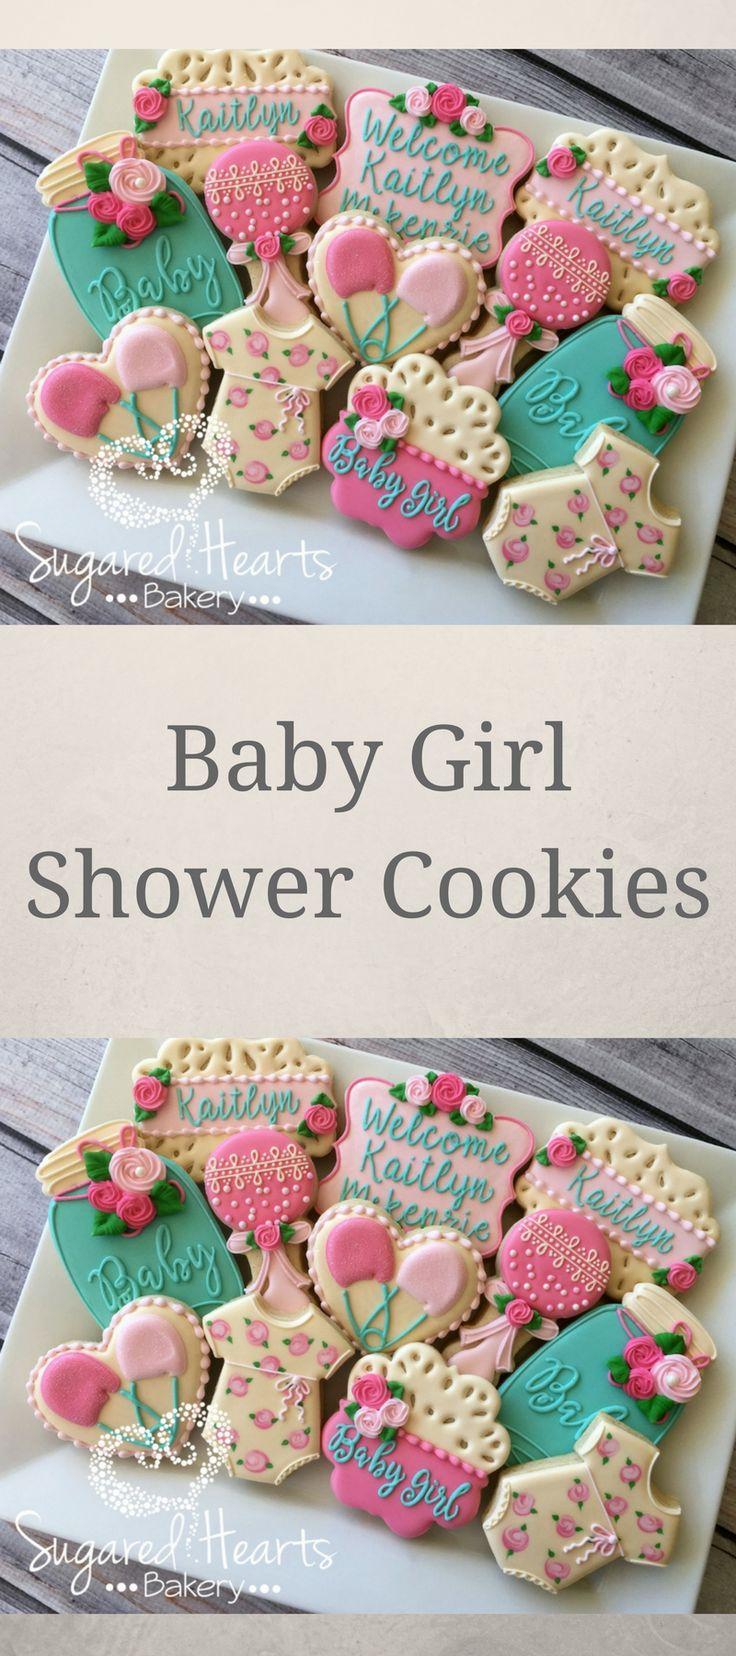 Shabby Chic Vintage Lace Floral Baby Shower Cookies - 1 Dozen #affiliate